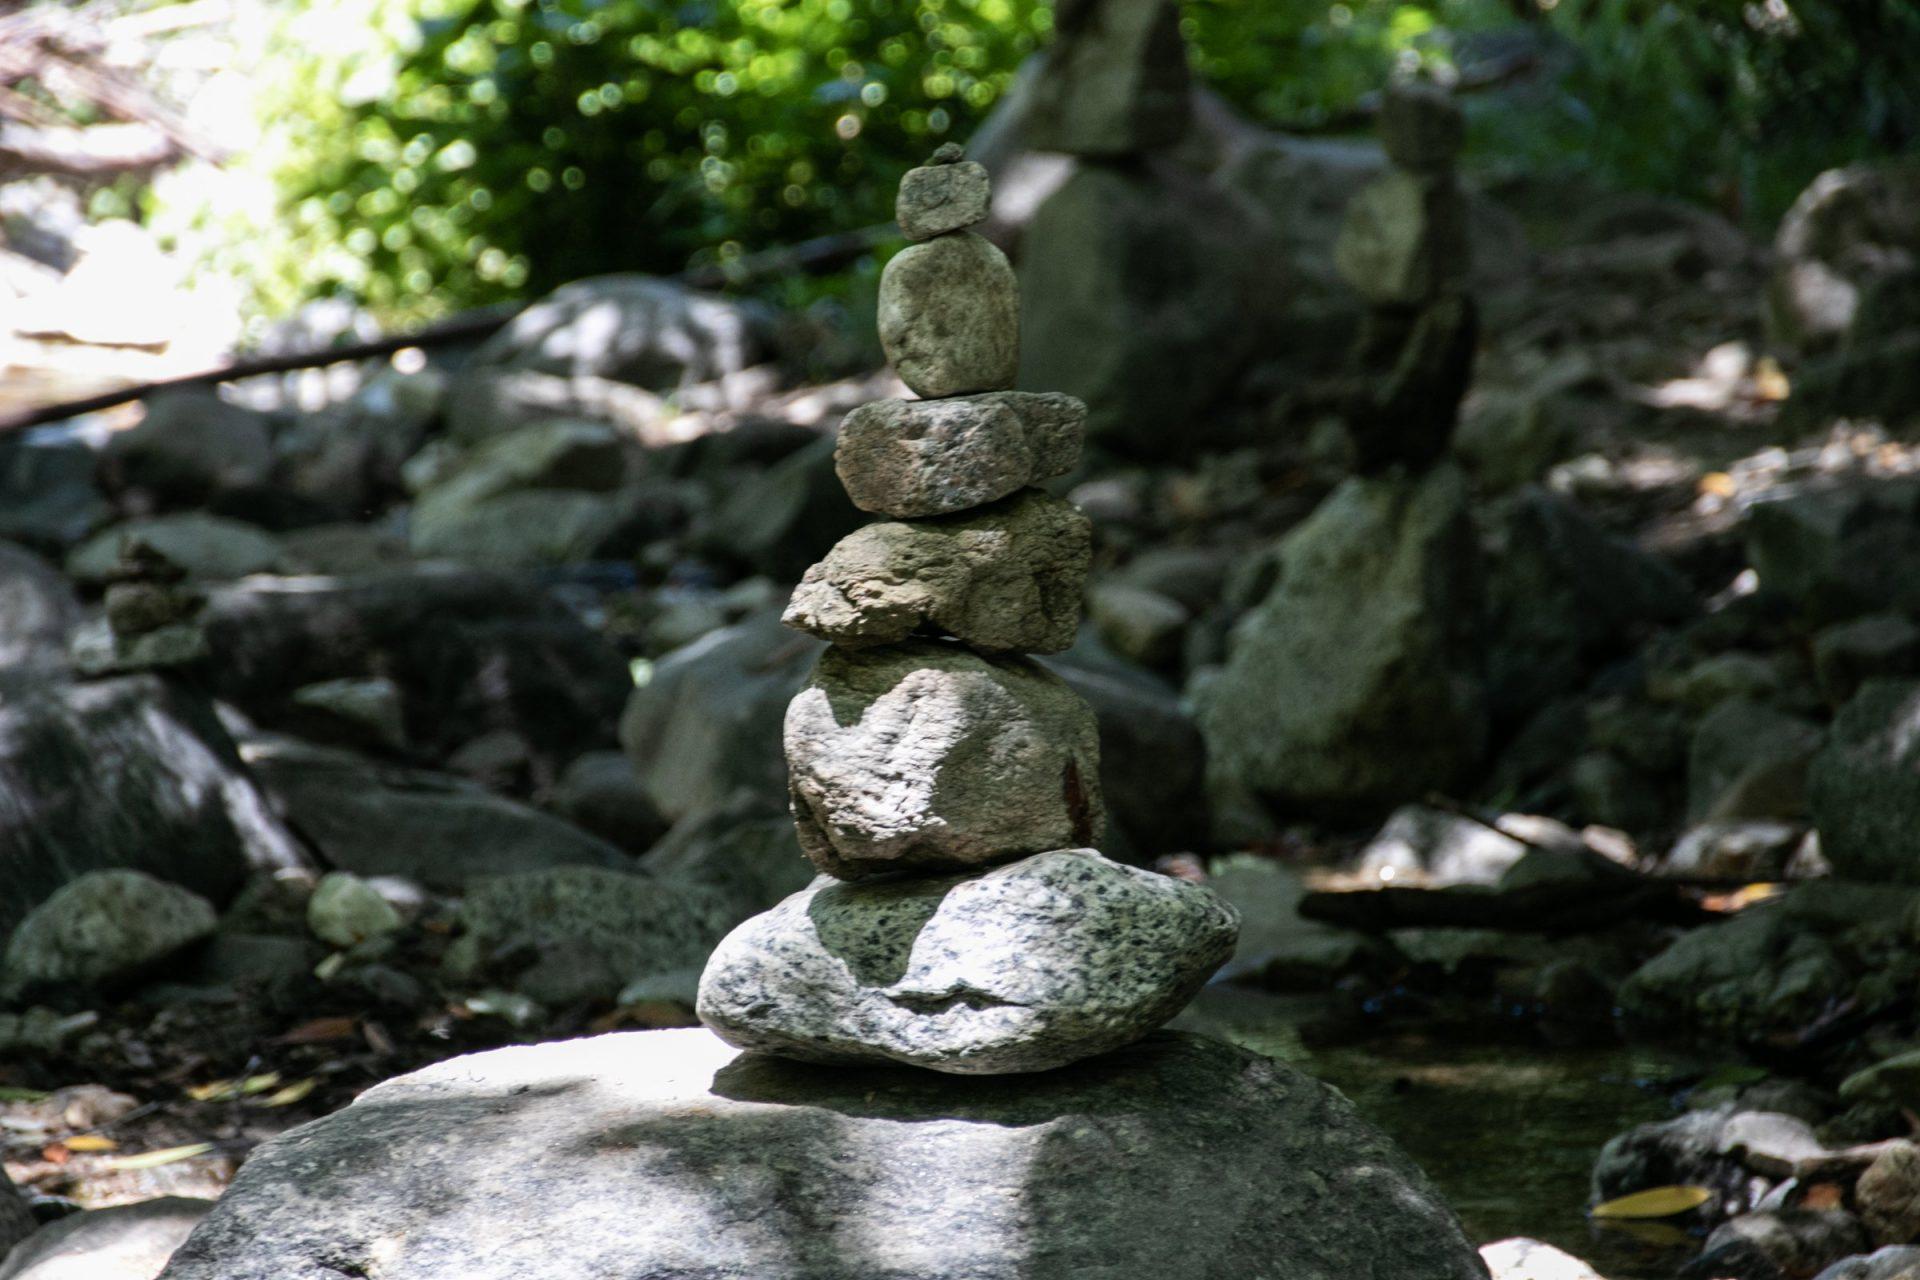 Stacked Rocks On Boulder In Nature